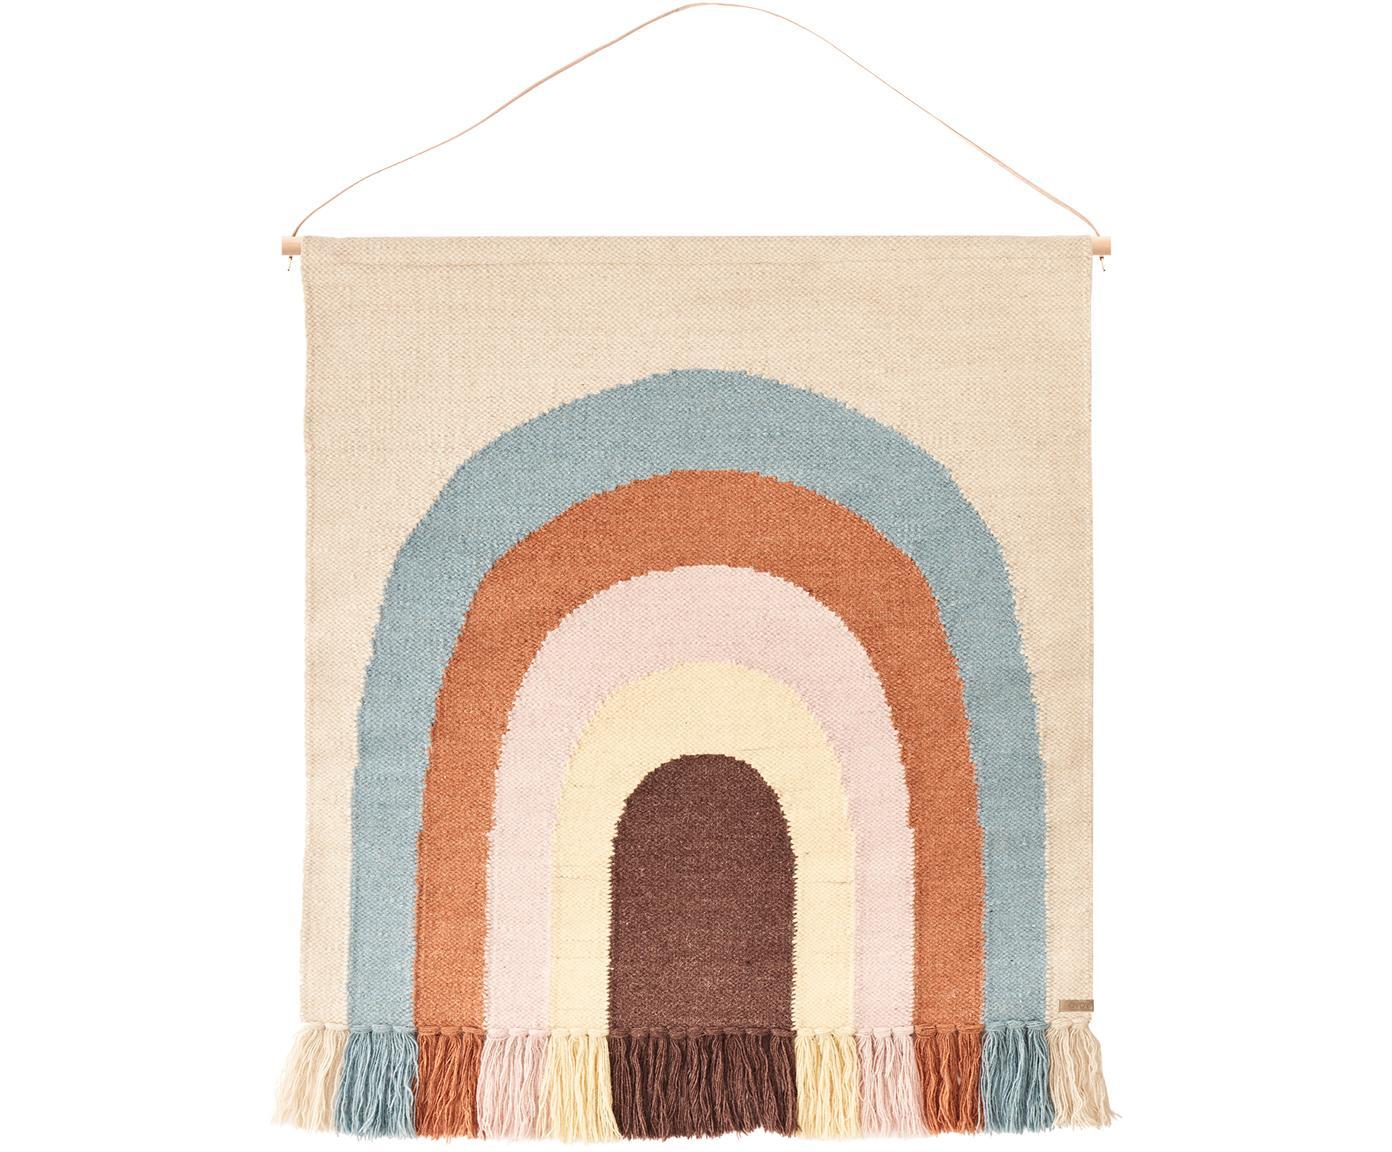 Decoración de pared Rainbow, 80%lana, 20%algodón, Beige, azul, naranja, rosa, crema, rosa palo, An 100 x Al 115 cm